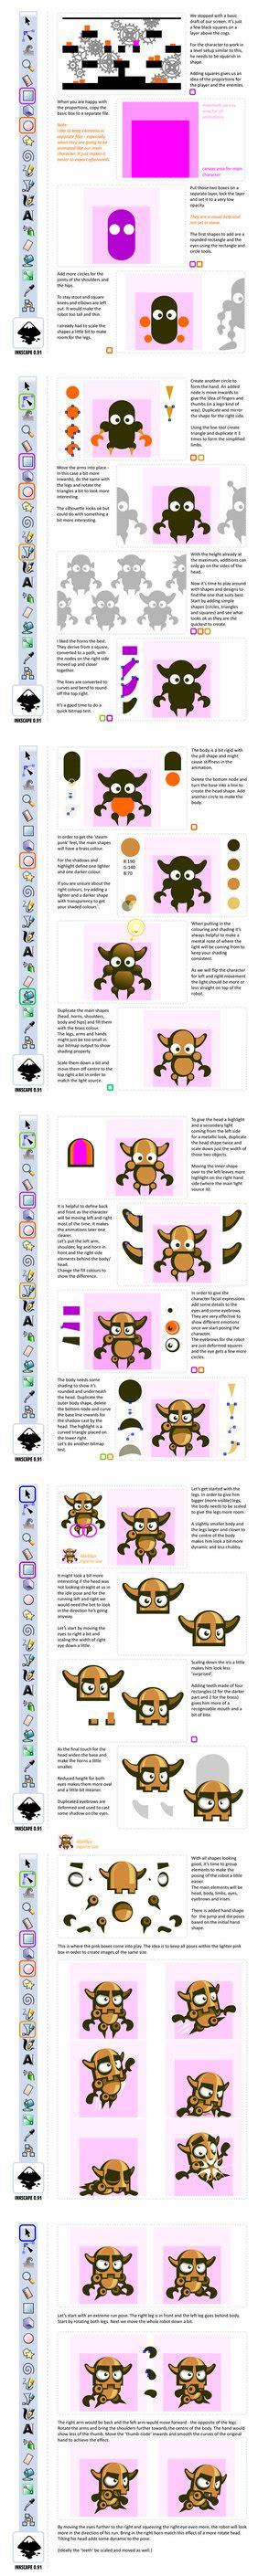 inkscape tutorial game character daydreamoz chris hildenbrand deviantart